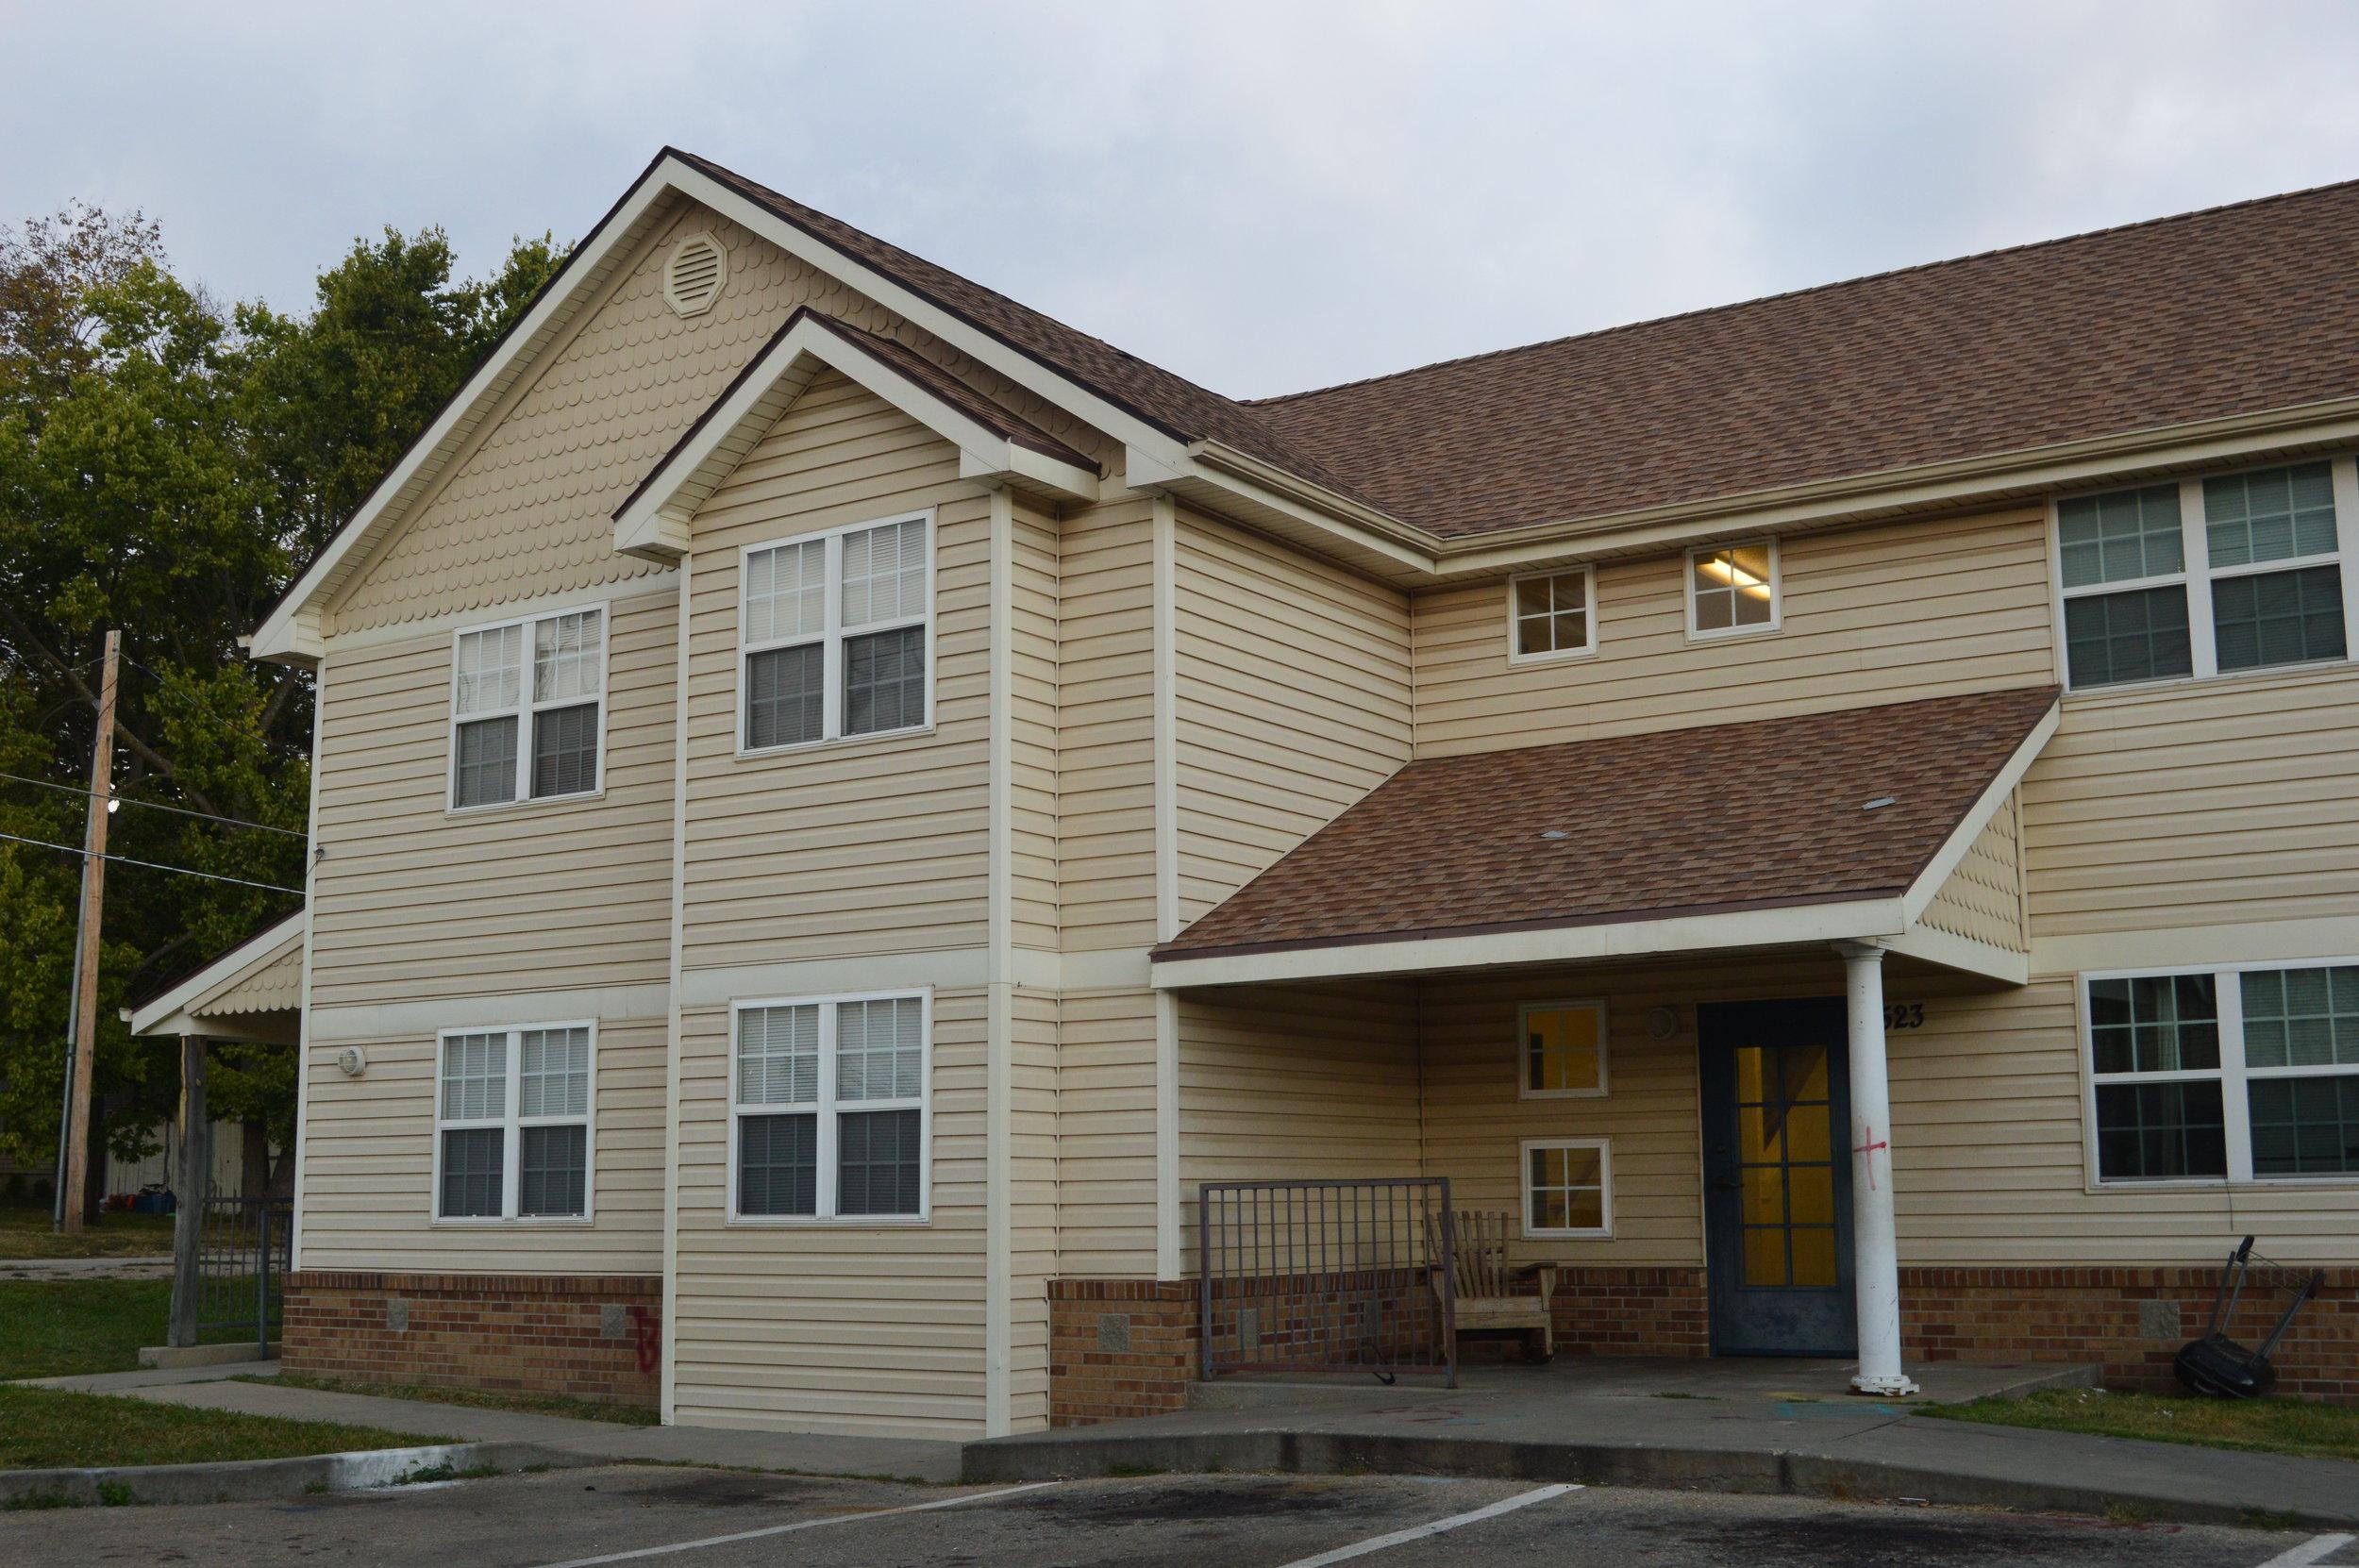 Cornerstone Apartments   Client: Cornerstone of Topeka Architect: Architect One P.A.